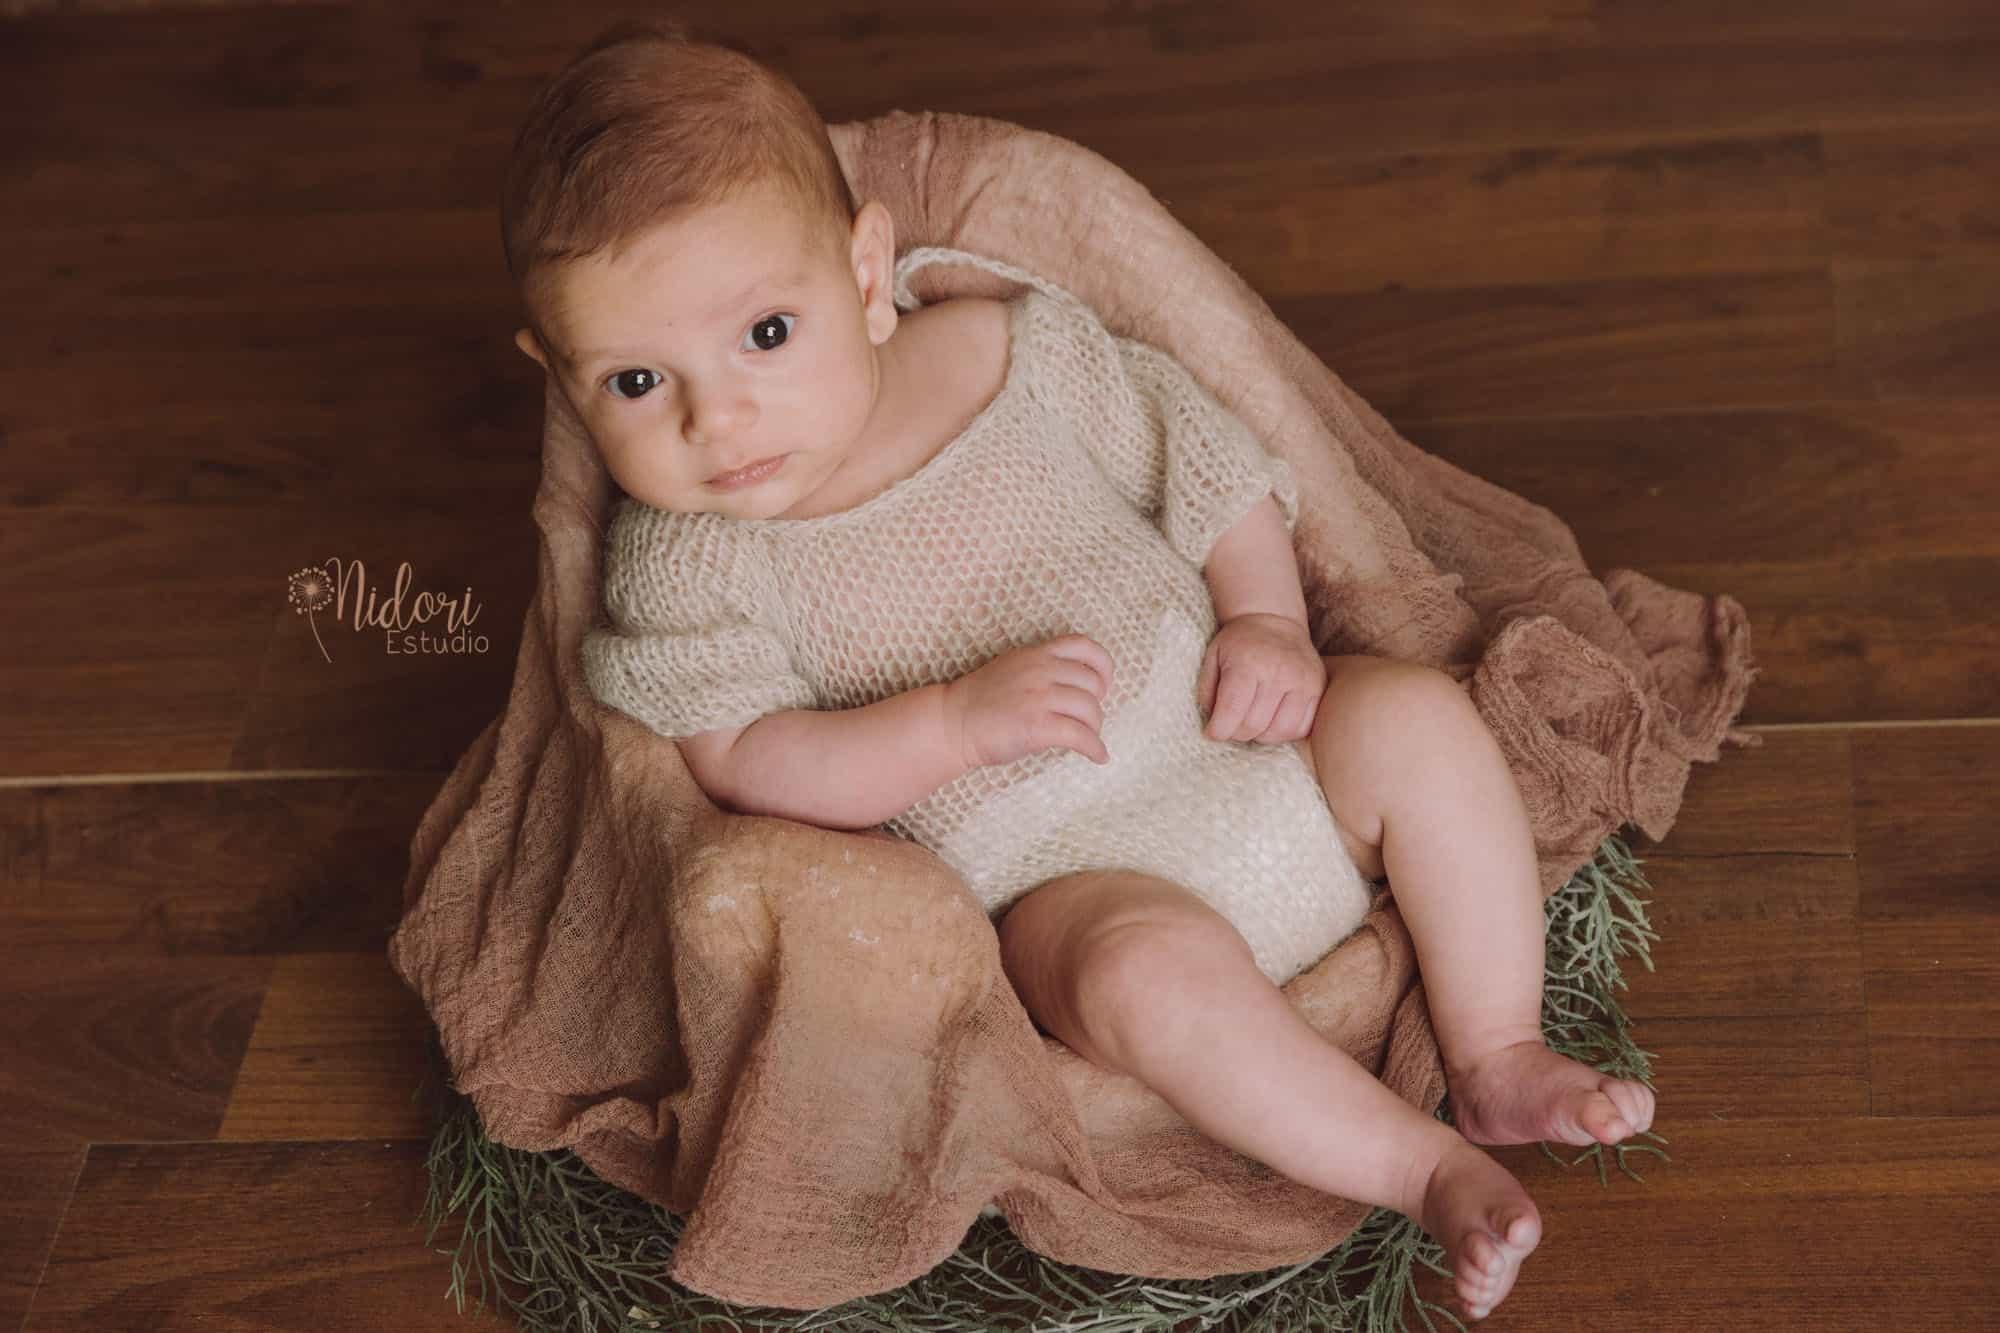 seguimiento-fotografia-niños-bebes-nidoriestudio-fotos-valencia-almazora-castellon-españa-spain-16